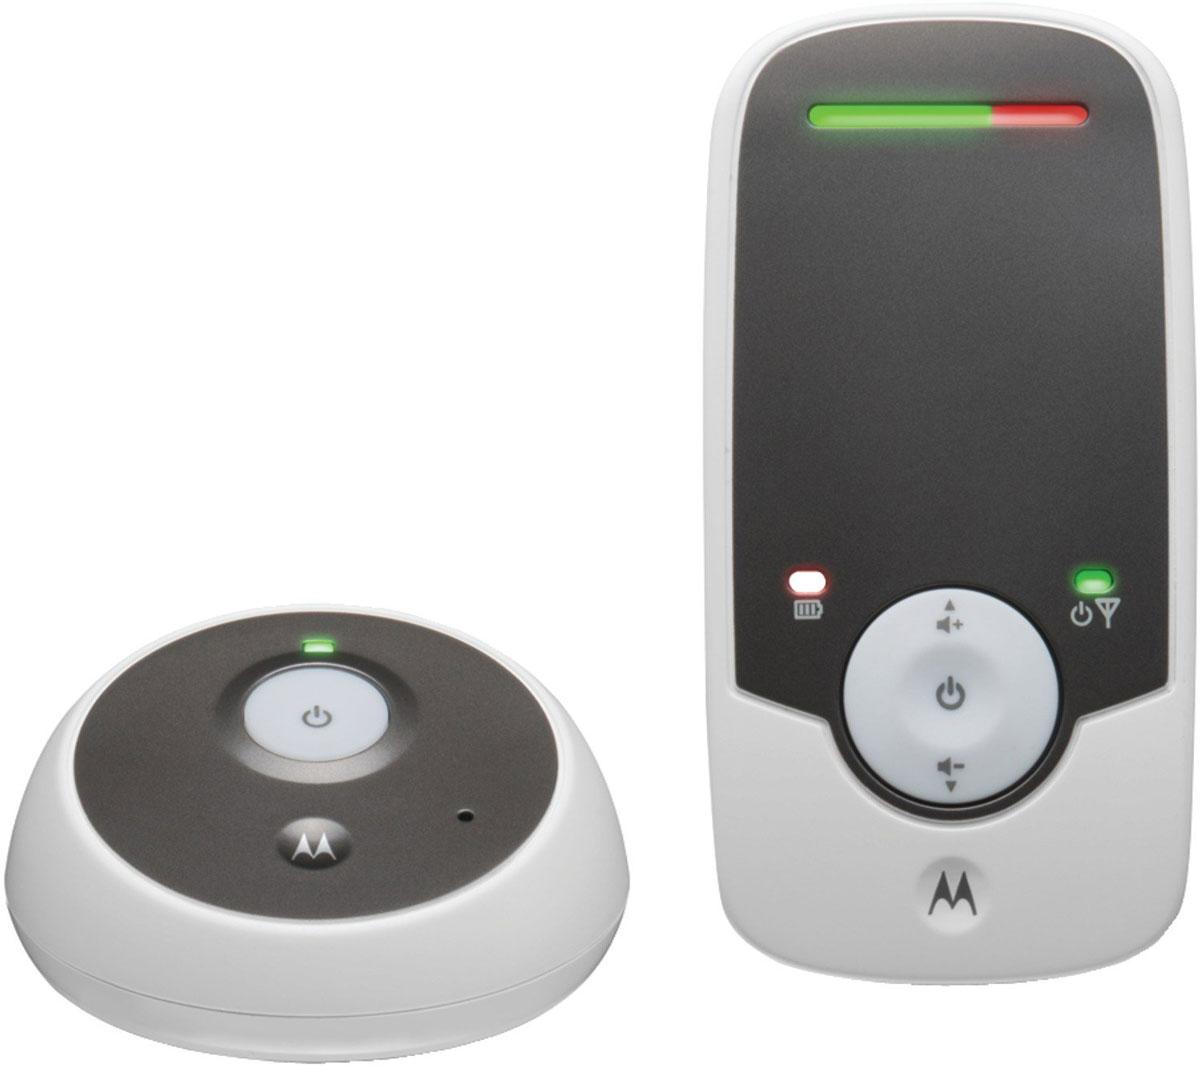 Motorola МВР160, White Black радионяня -  Безопасность ребенка